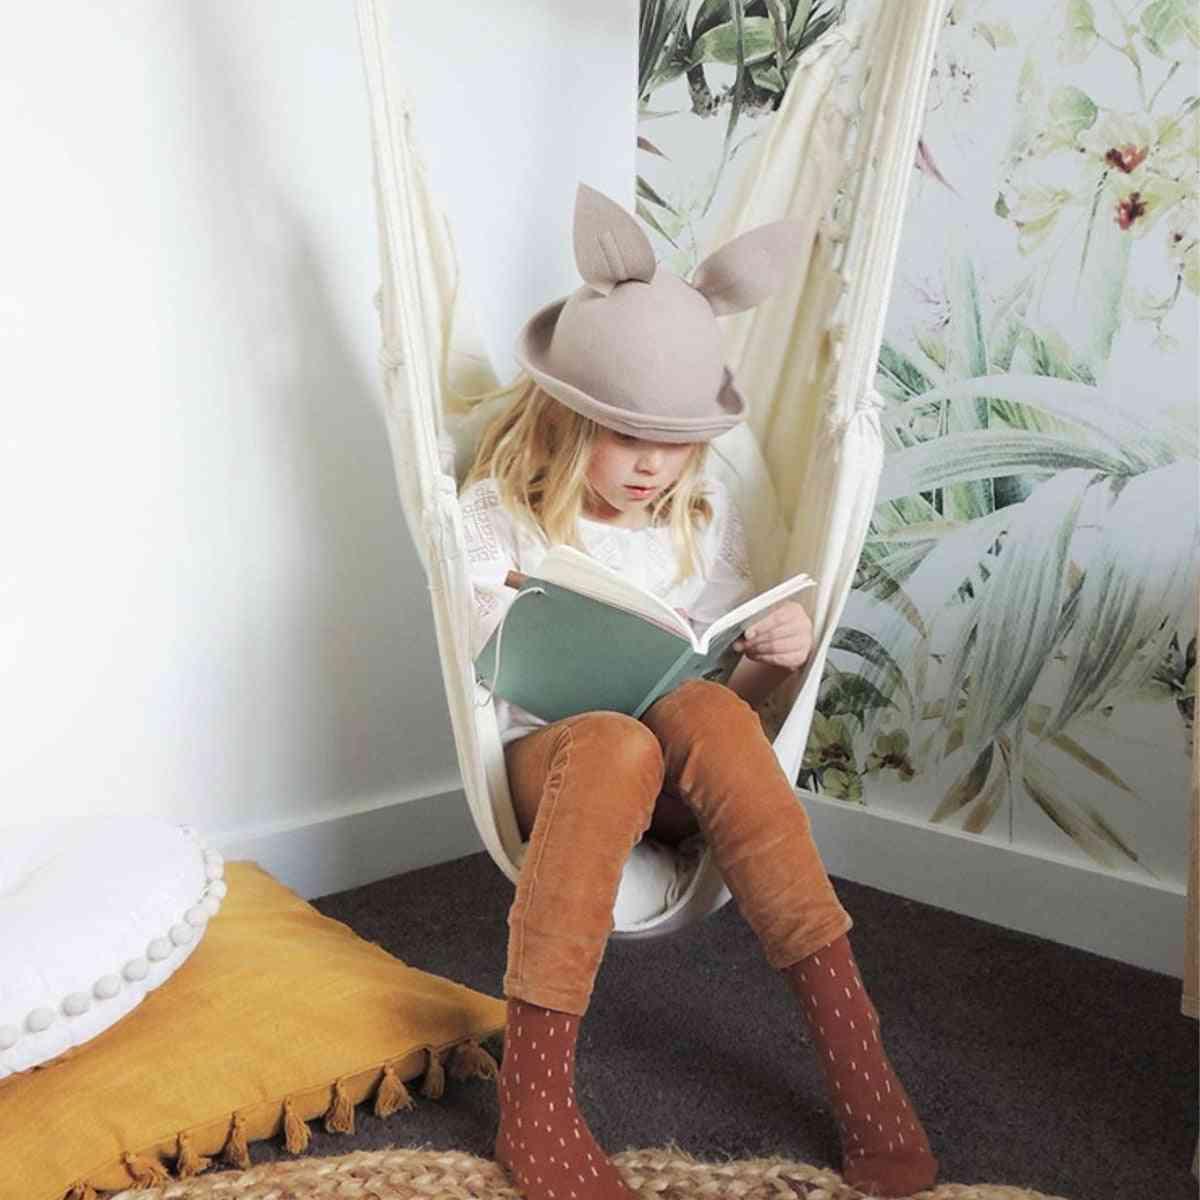 Outdoor Indoor Dormitory Swing Hanging Chair With Wooden Rod